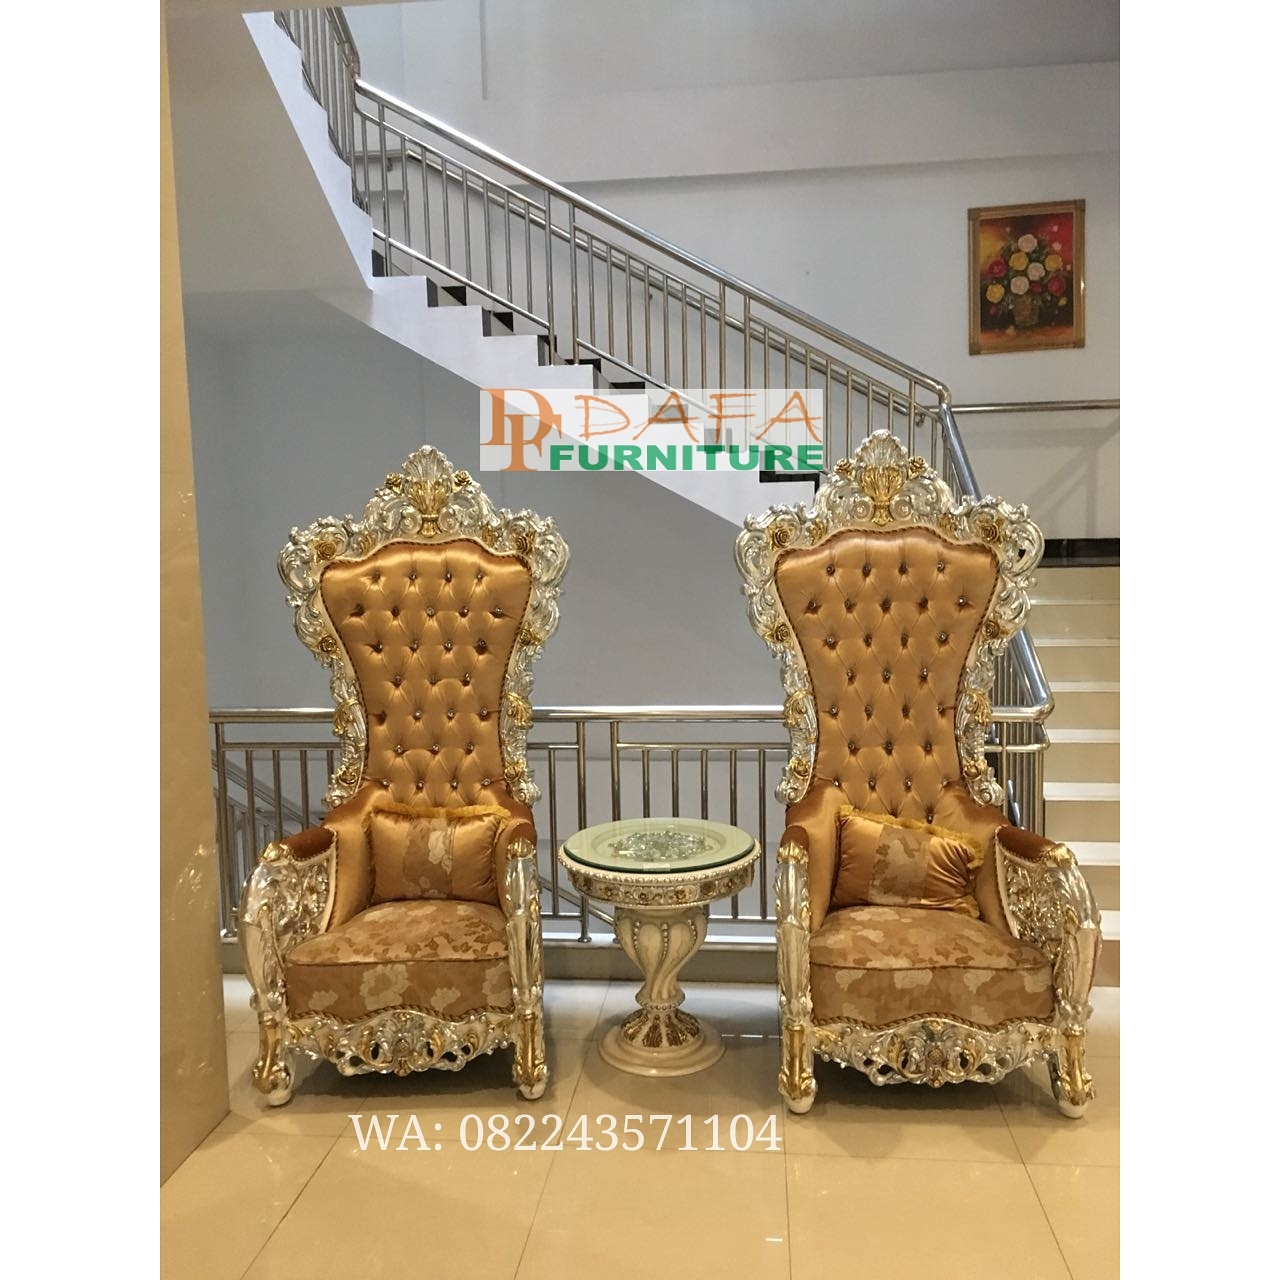 Set Kursi Sofa Teras Ukir Jepara Mewah Terbaru